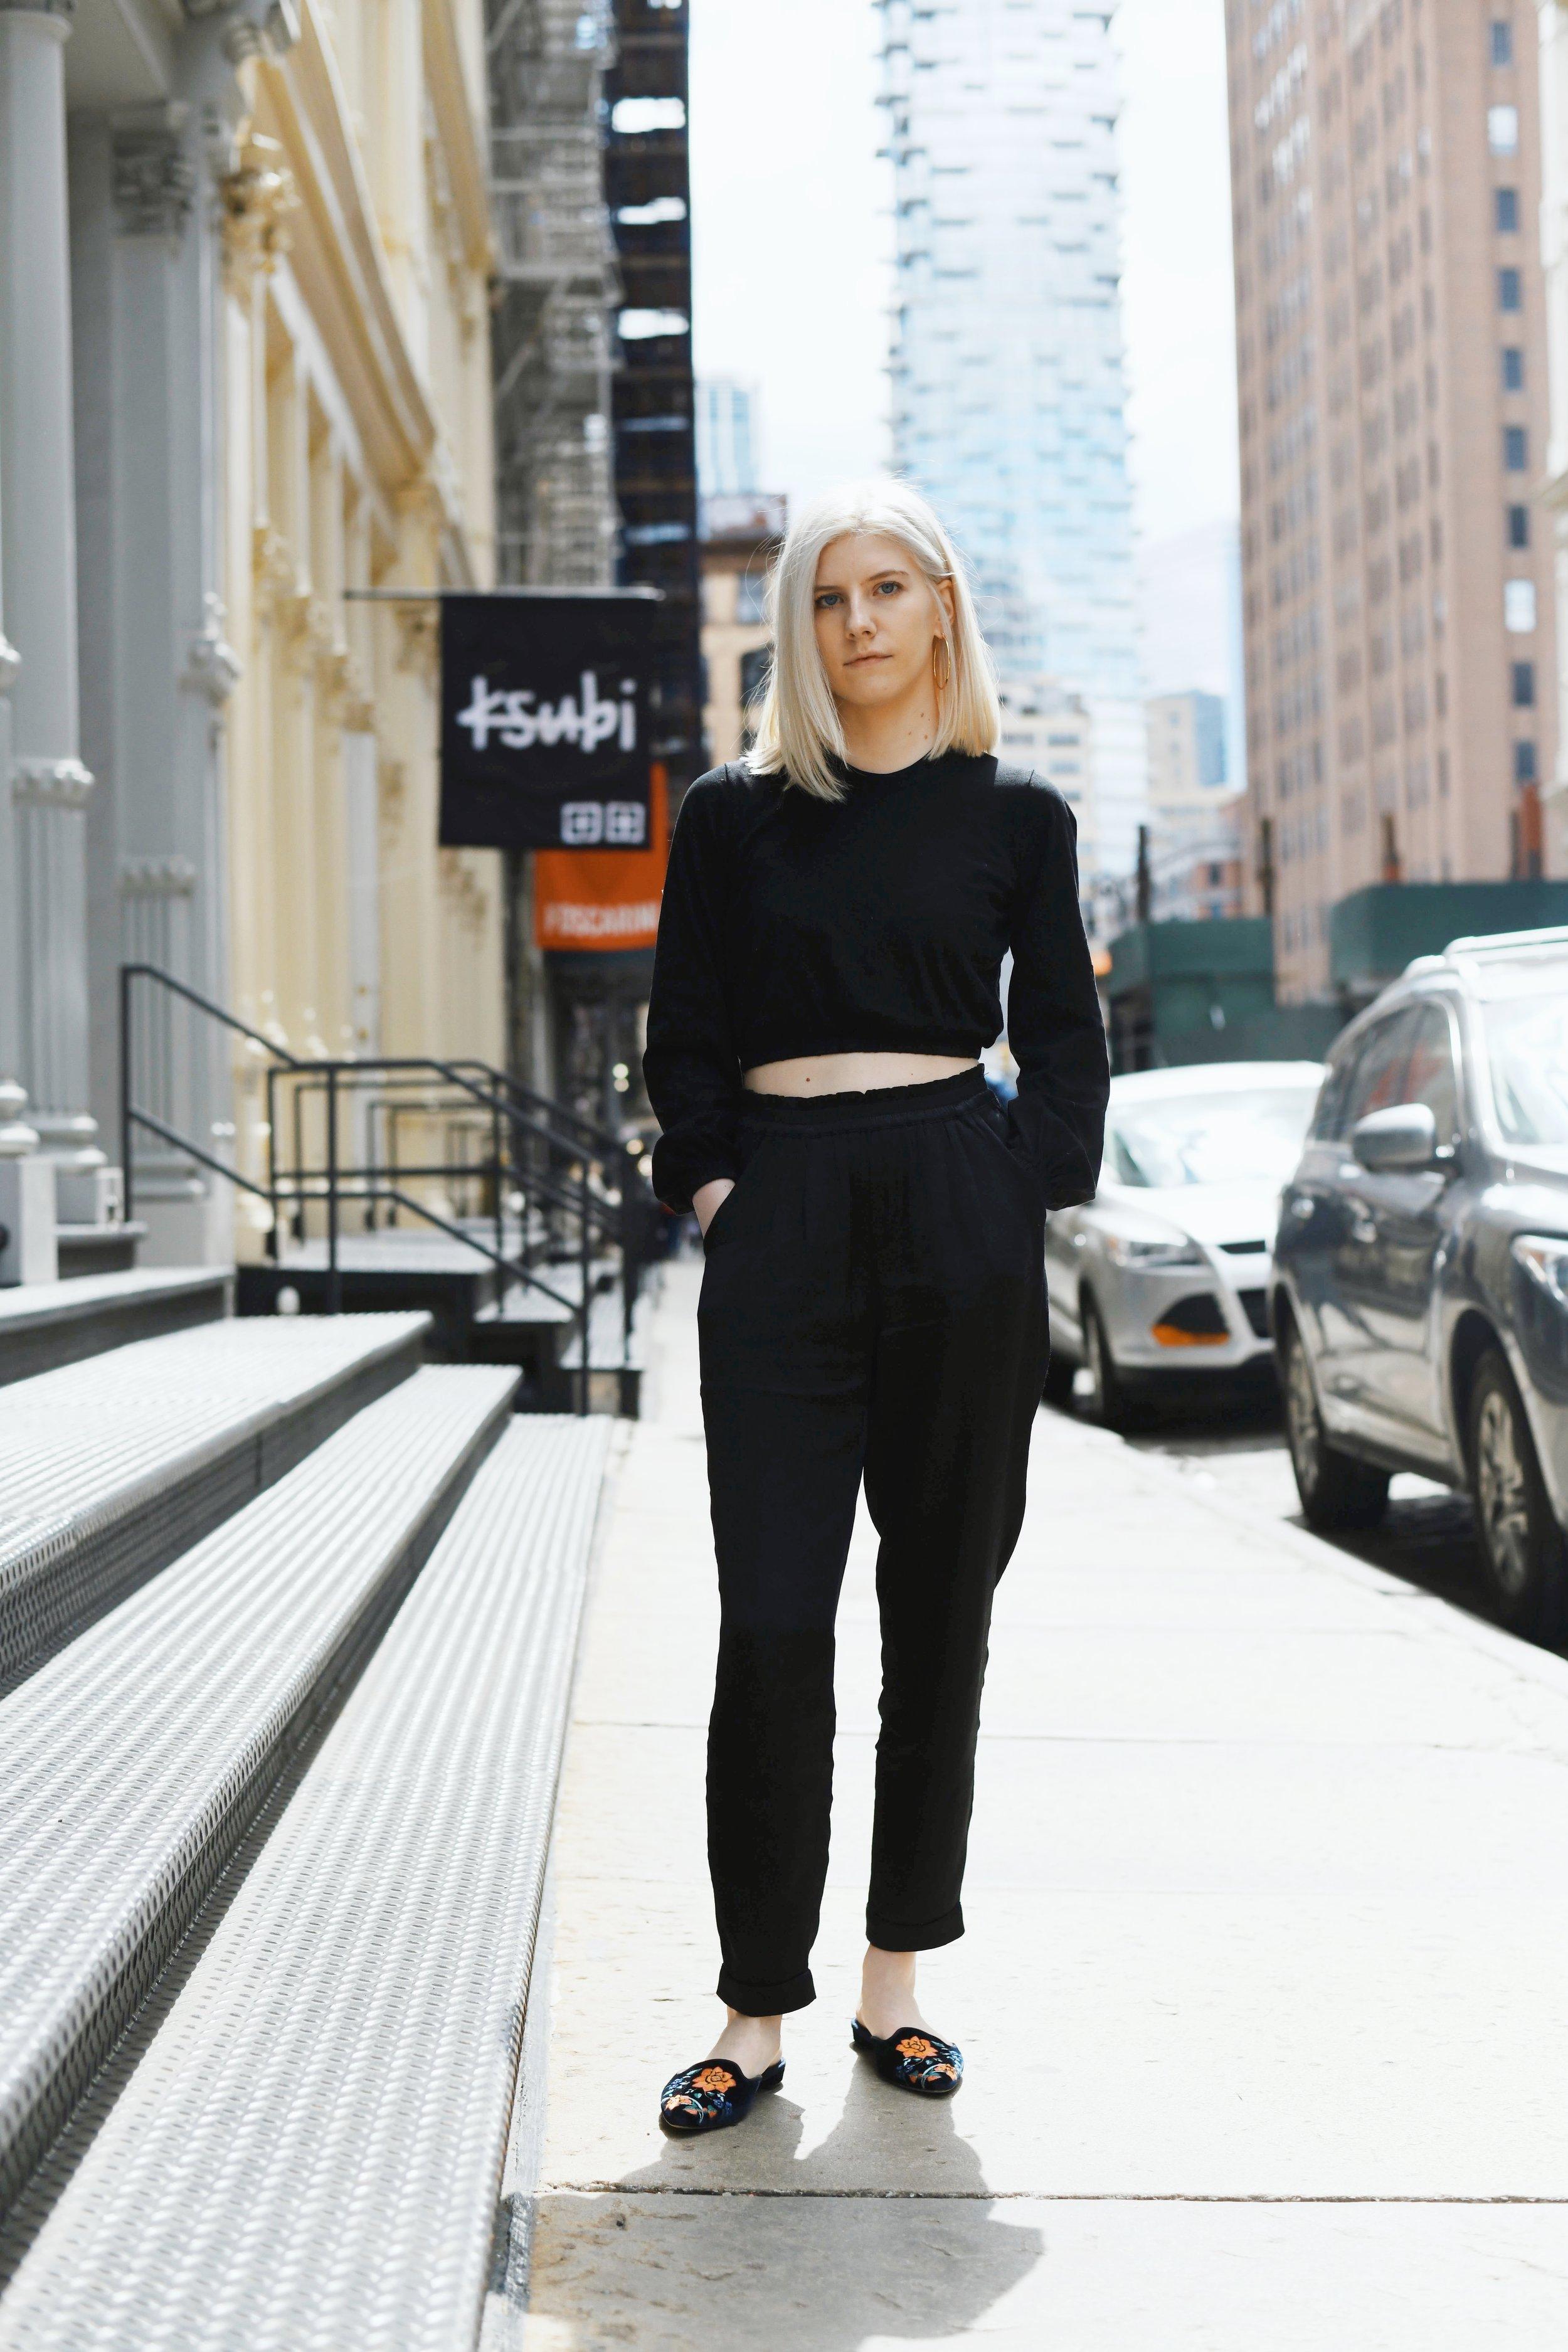 SoHo, Manhattan  April 2018